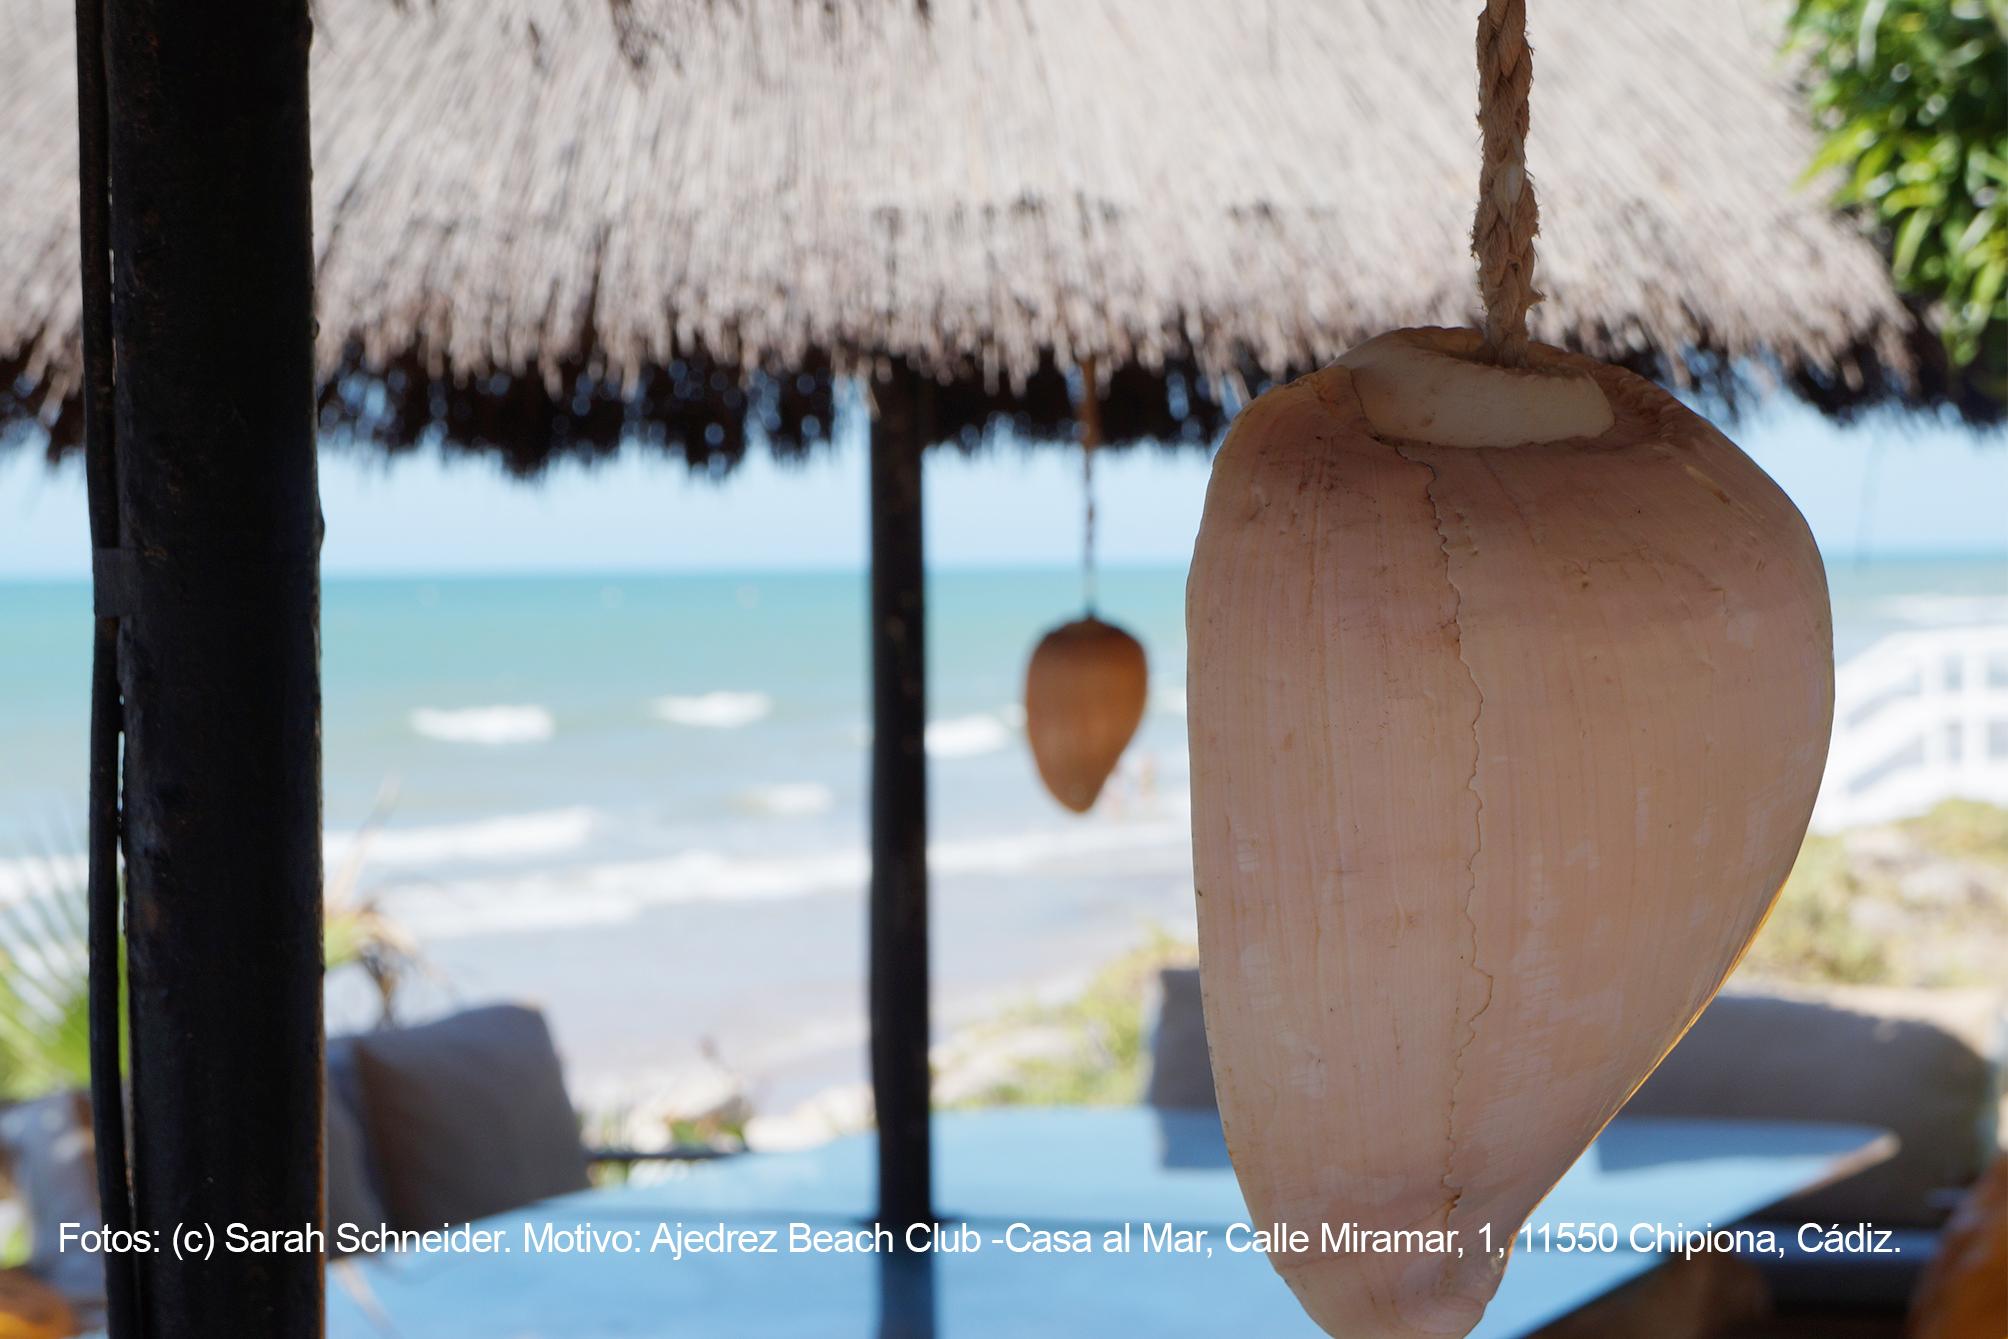 Ajedrez Beach Club - Casa al Mar, Calle Miramar, 1, 11550